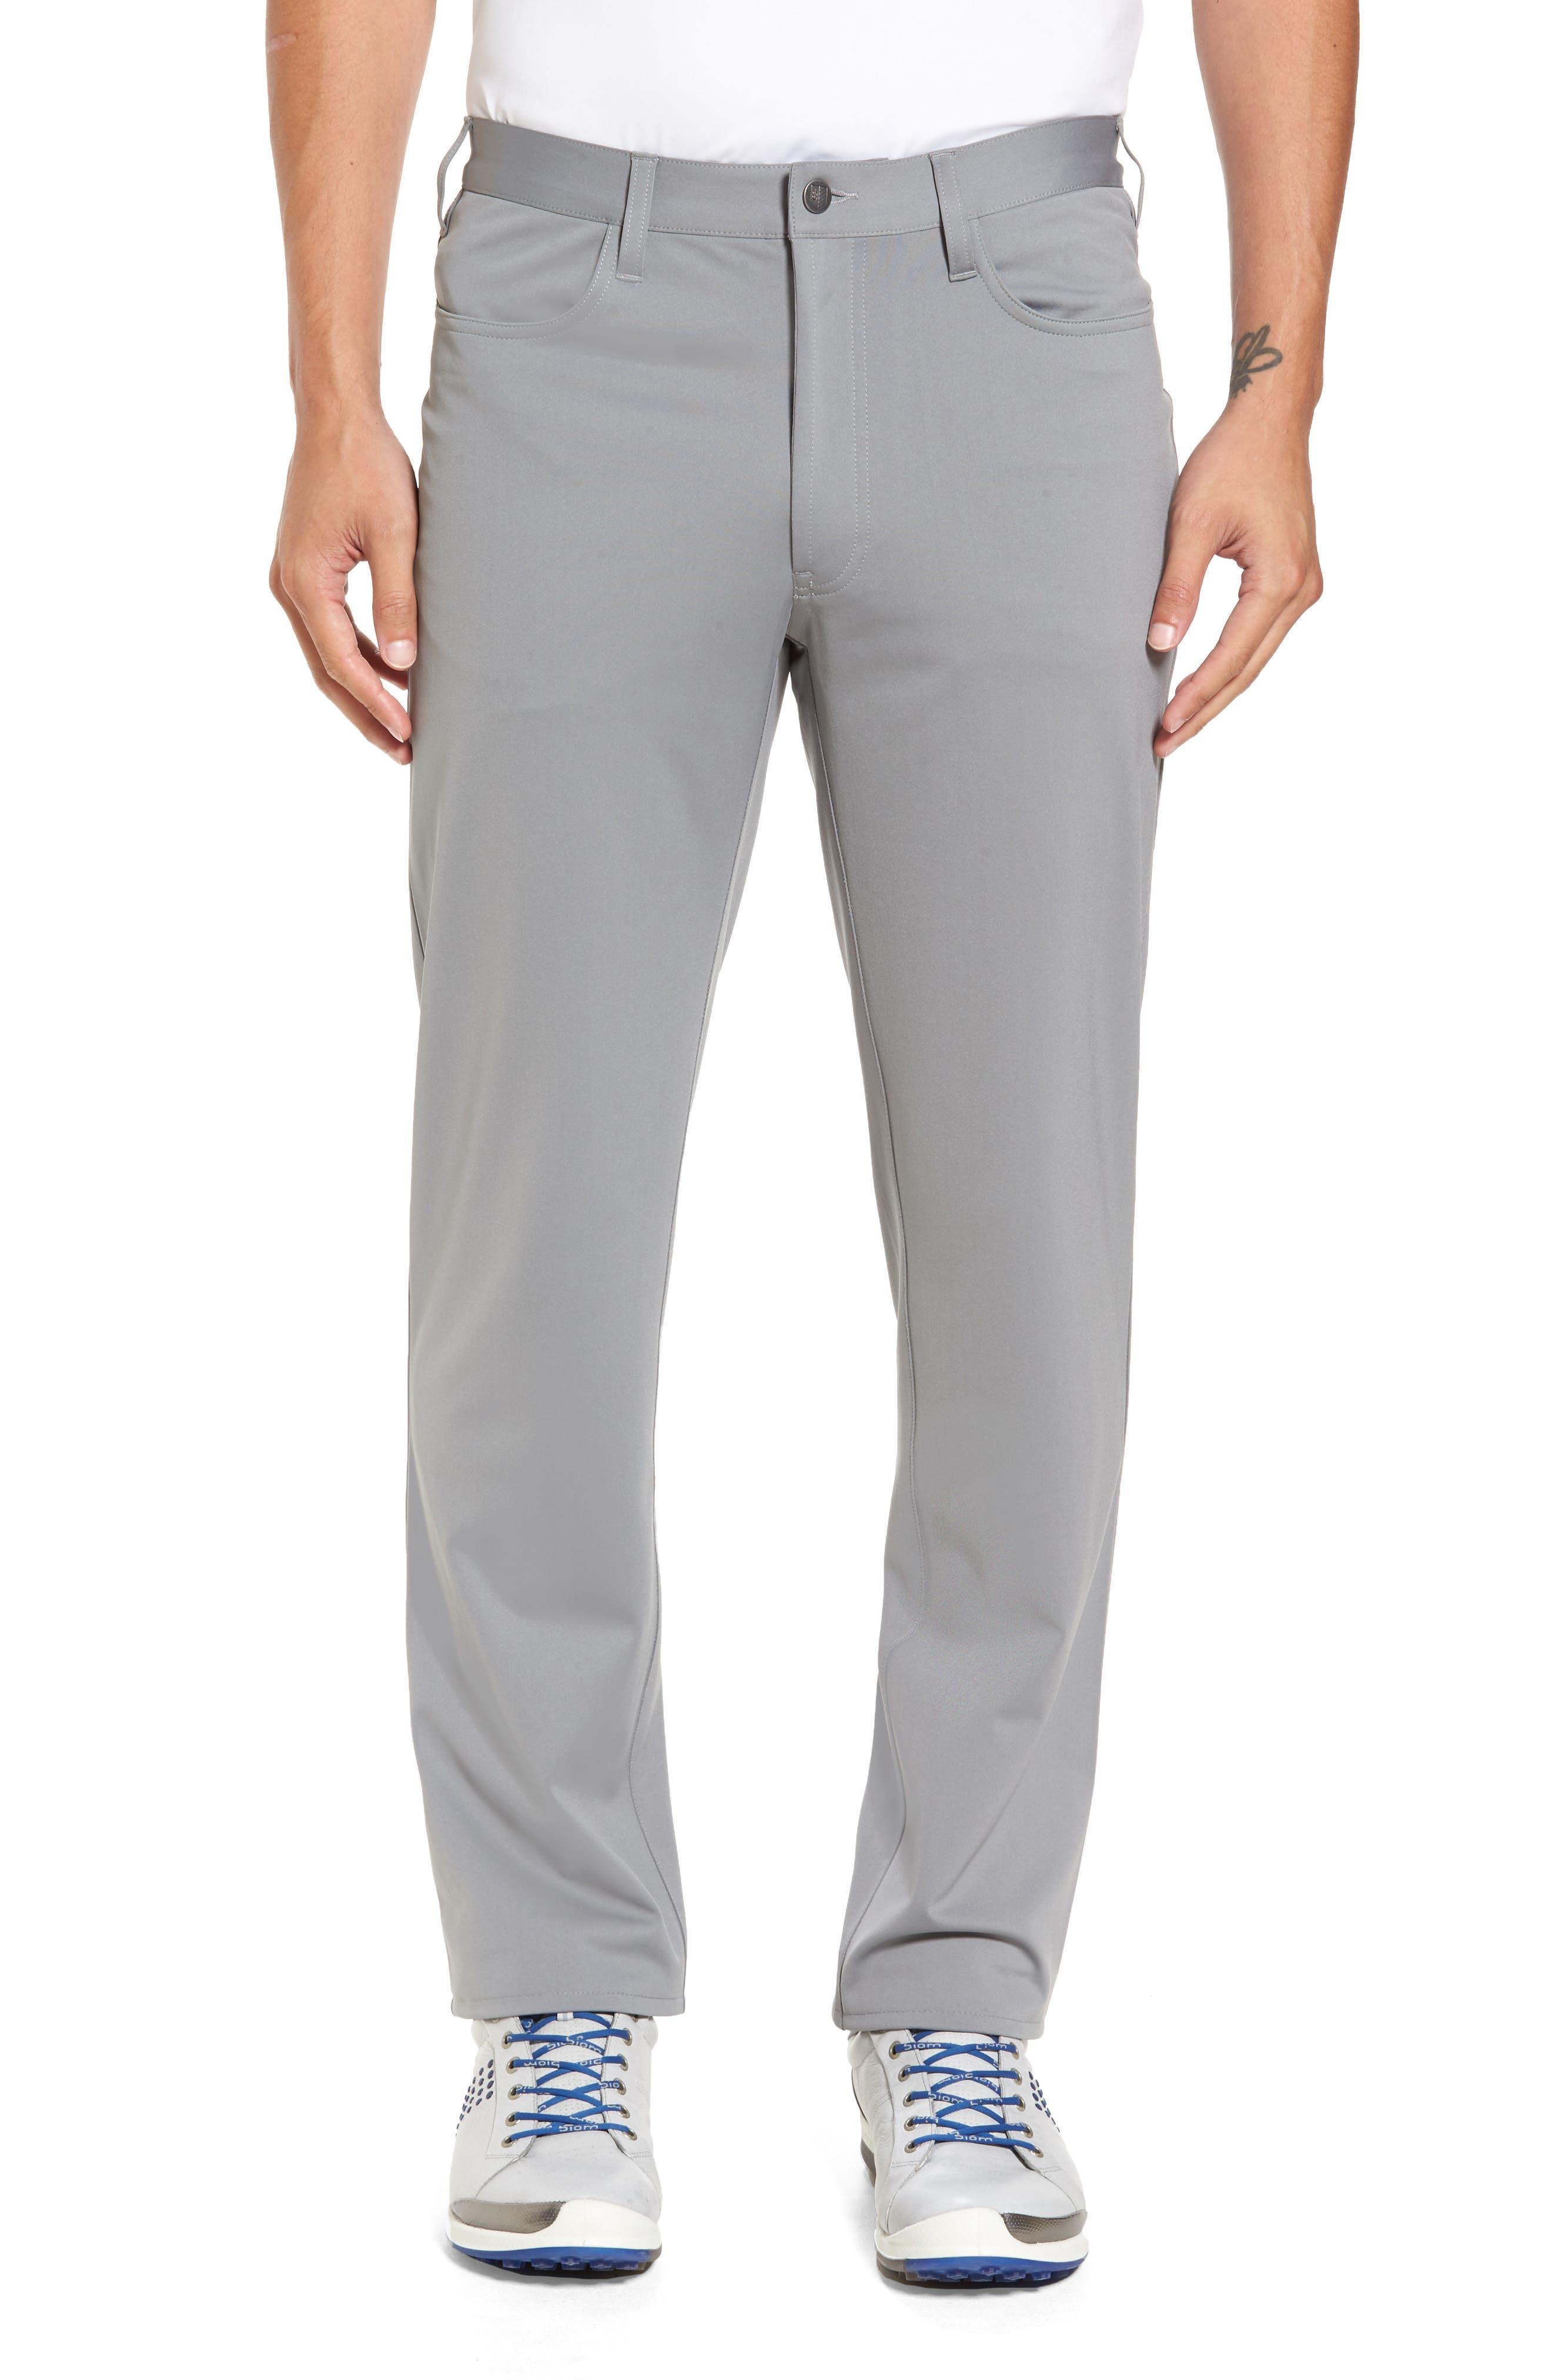 Bobby Jones R18 Tech Pants